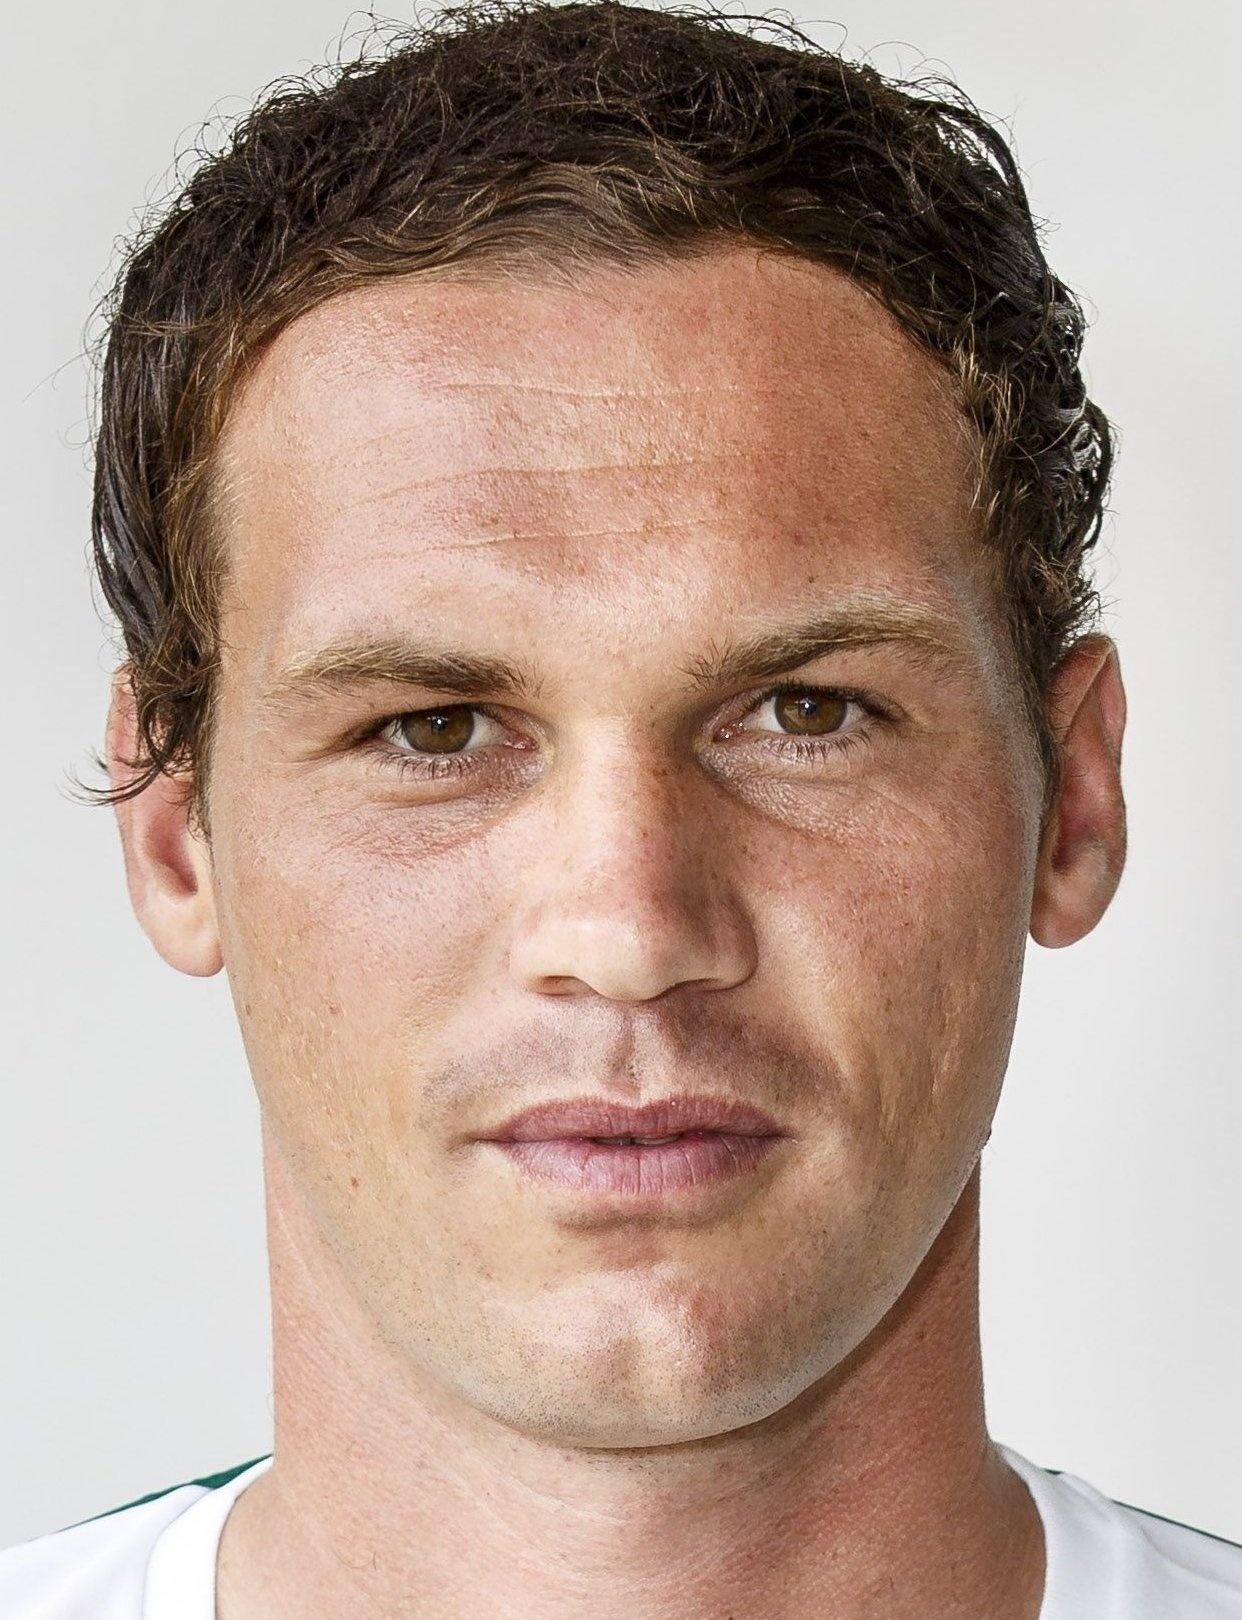 Patrick B Rger Player Profile 17 18 Transfermarkt